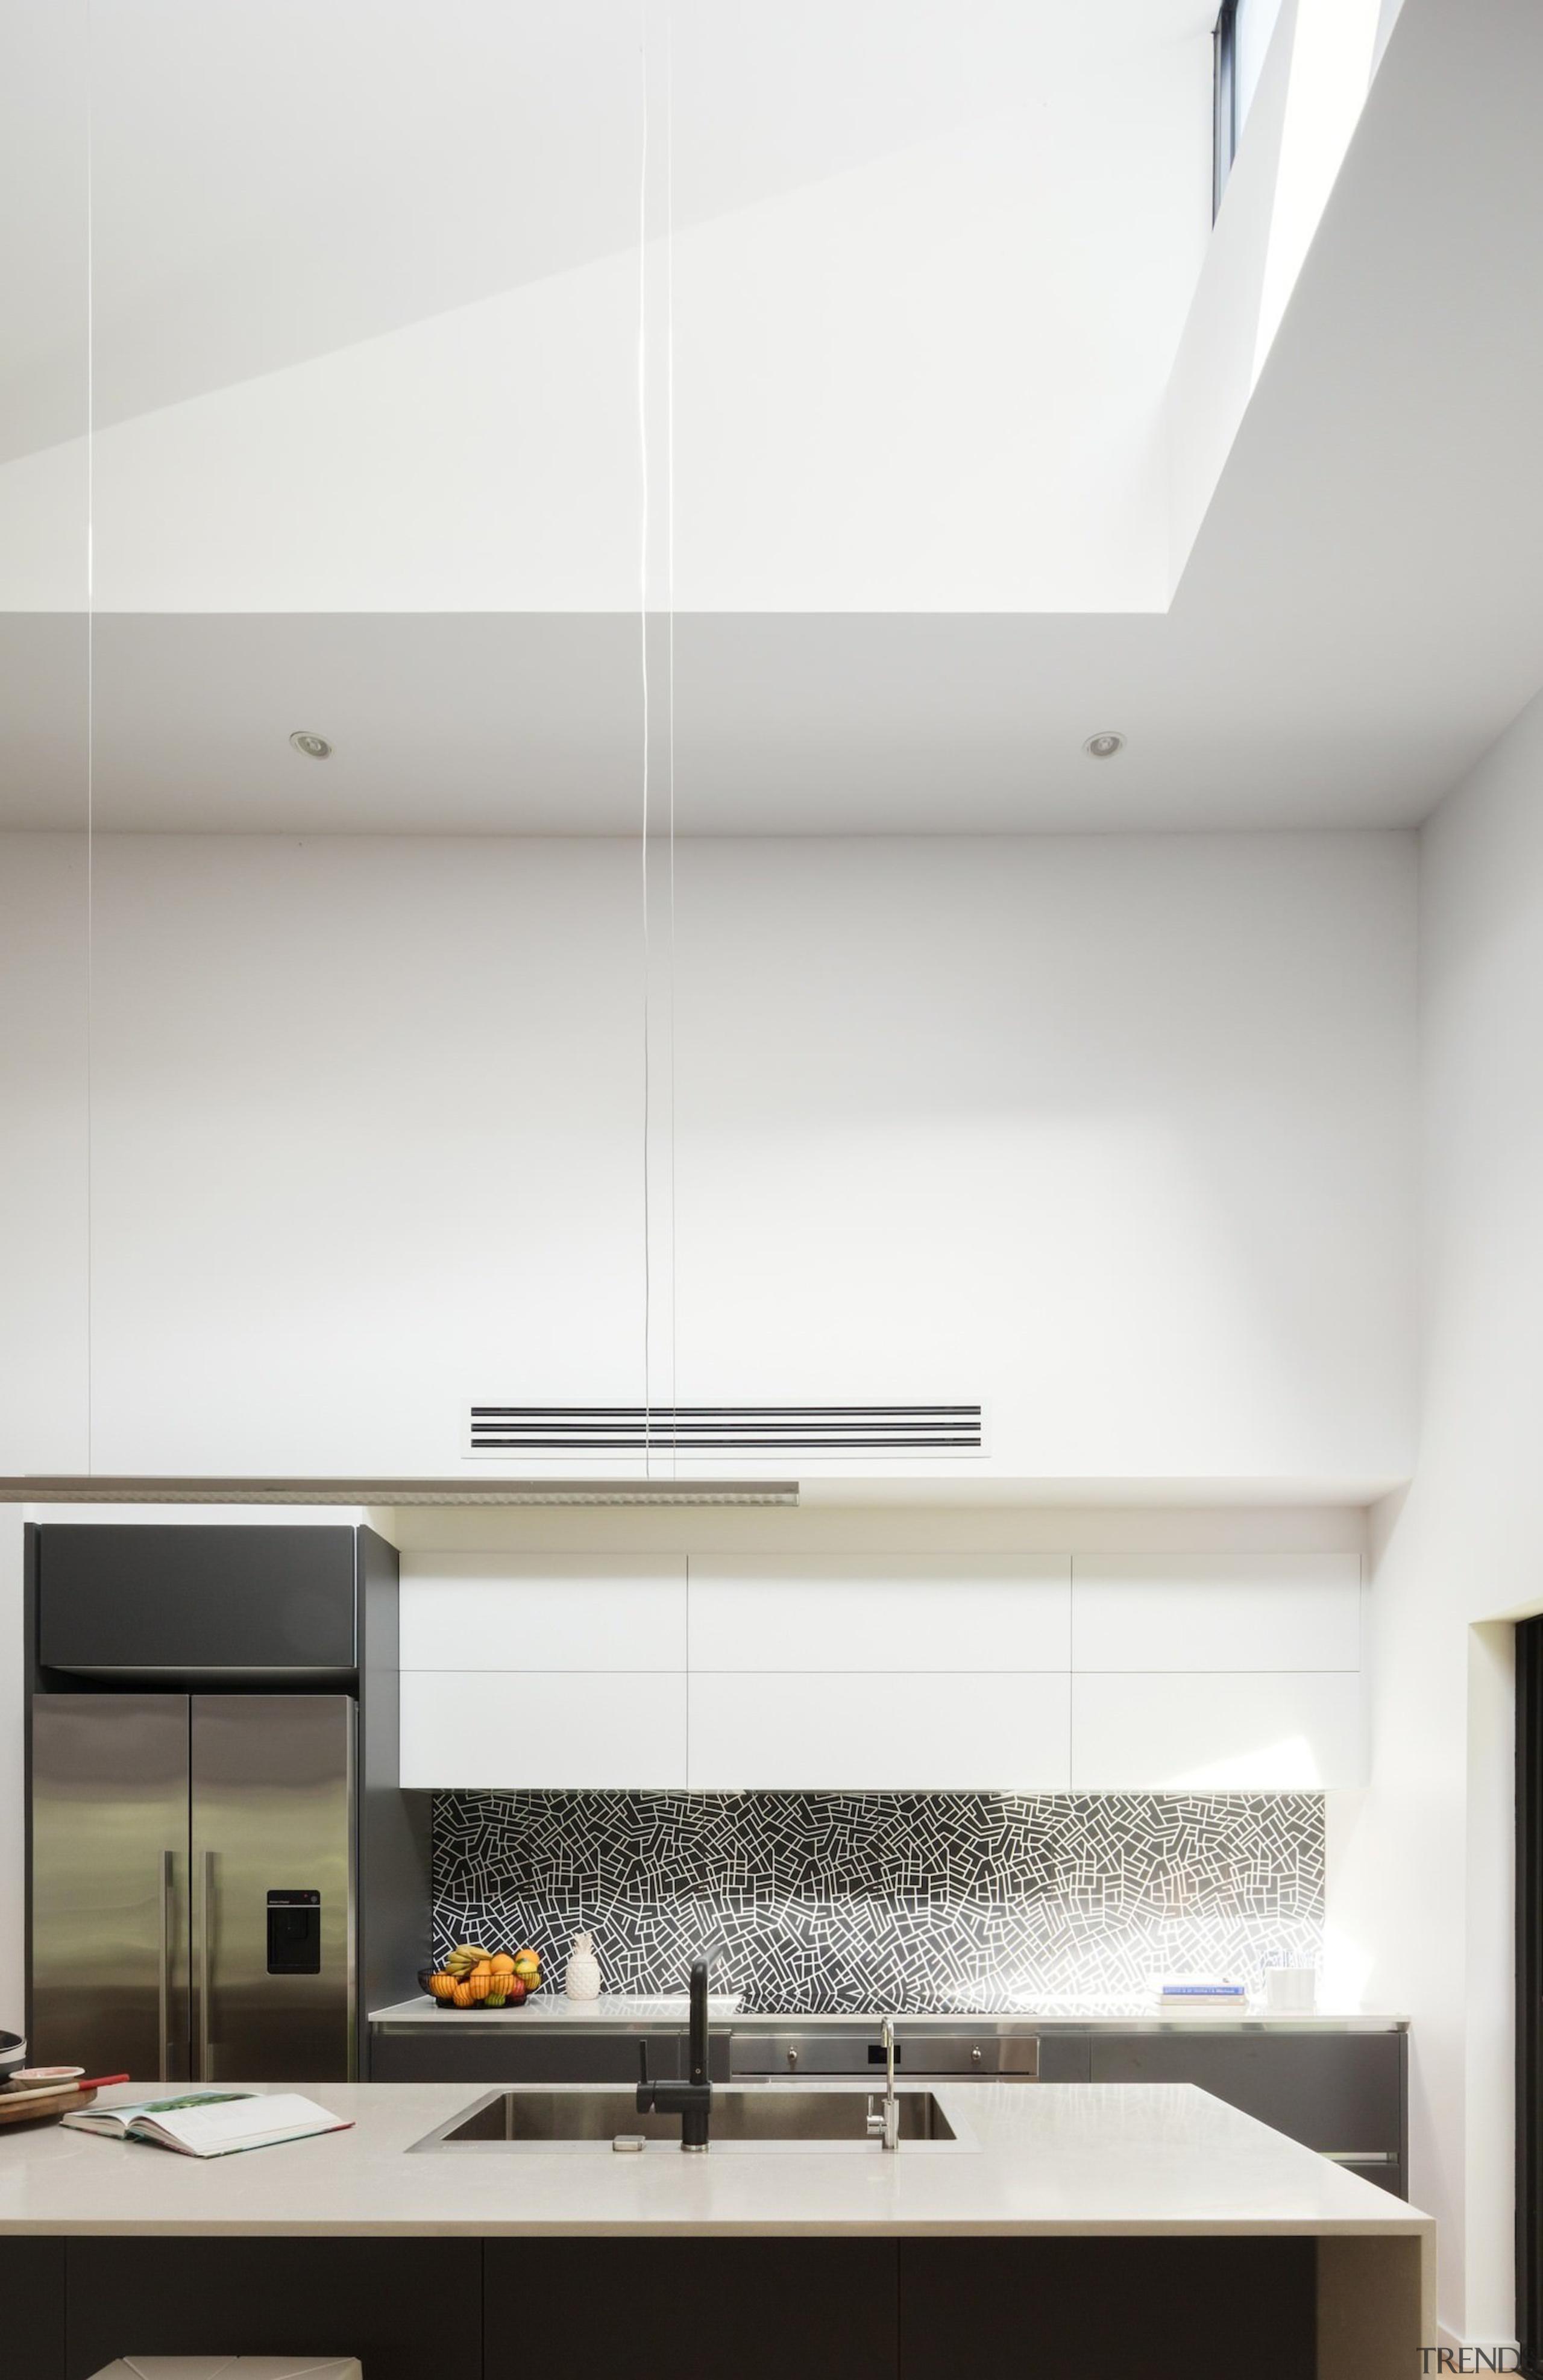 Bijl Architecture architecture, ceiling, daylighting, house, interior design, kitchen, light fixture, lighting, product design, white